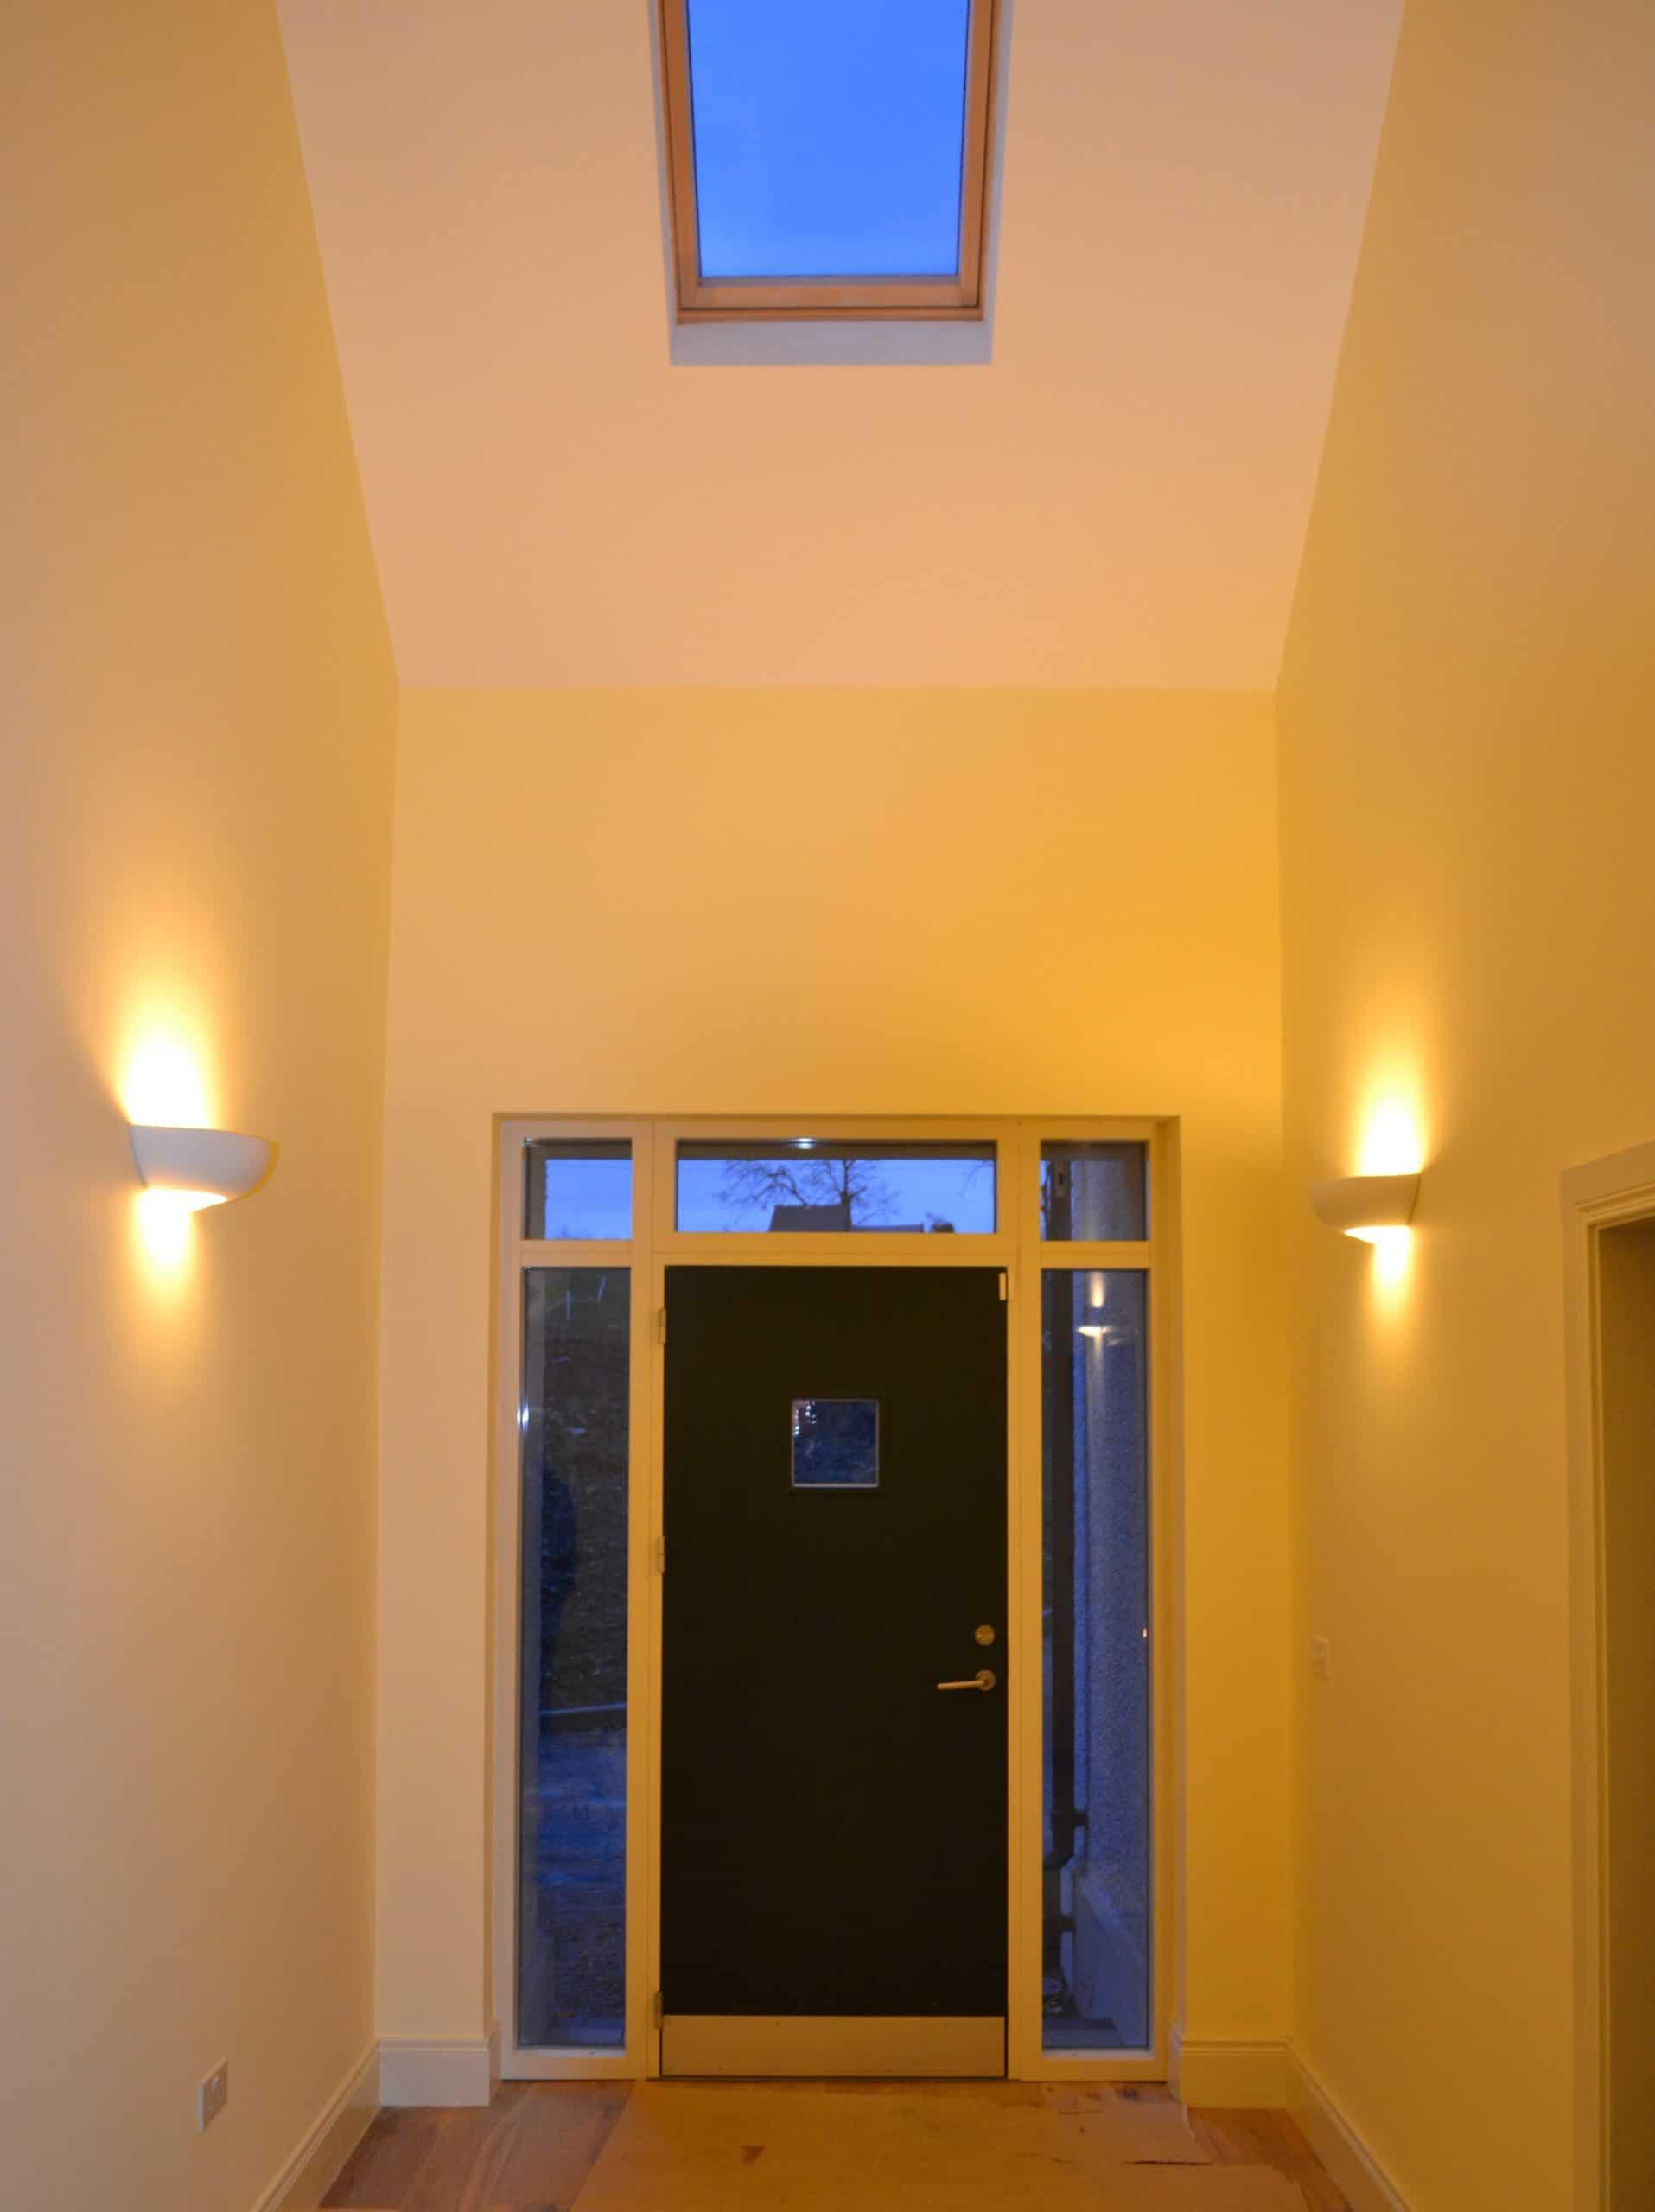 Quigg Dwelling - Entrance Hallway Detail